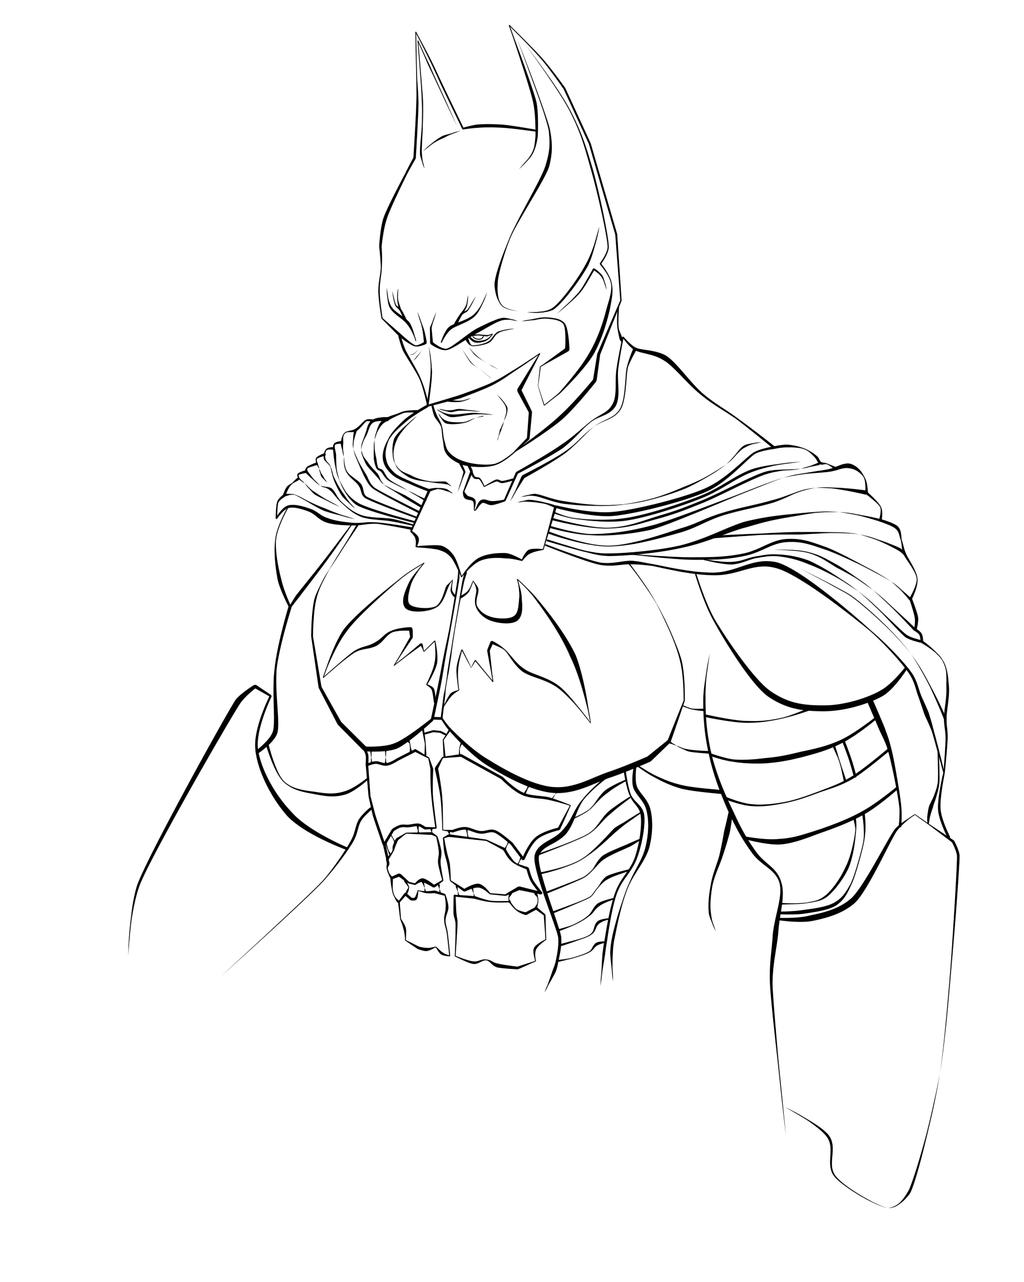 Line Art Comic : Batman line art sketch by renixis on deviantart